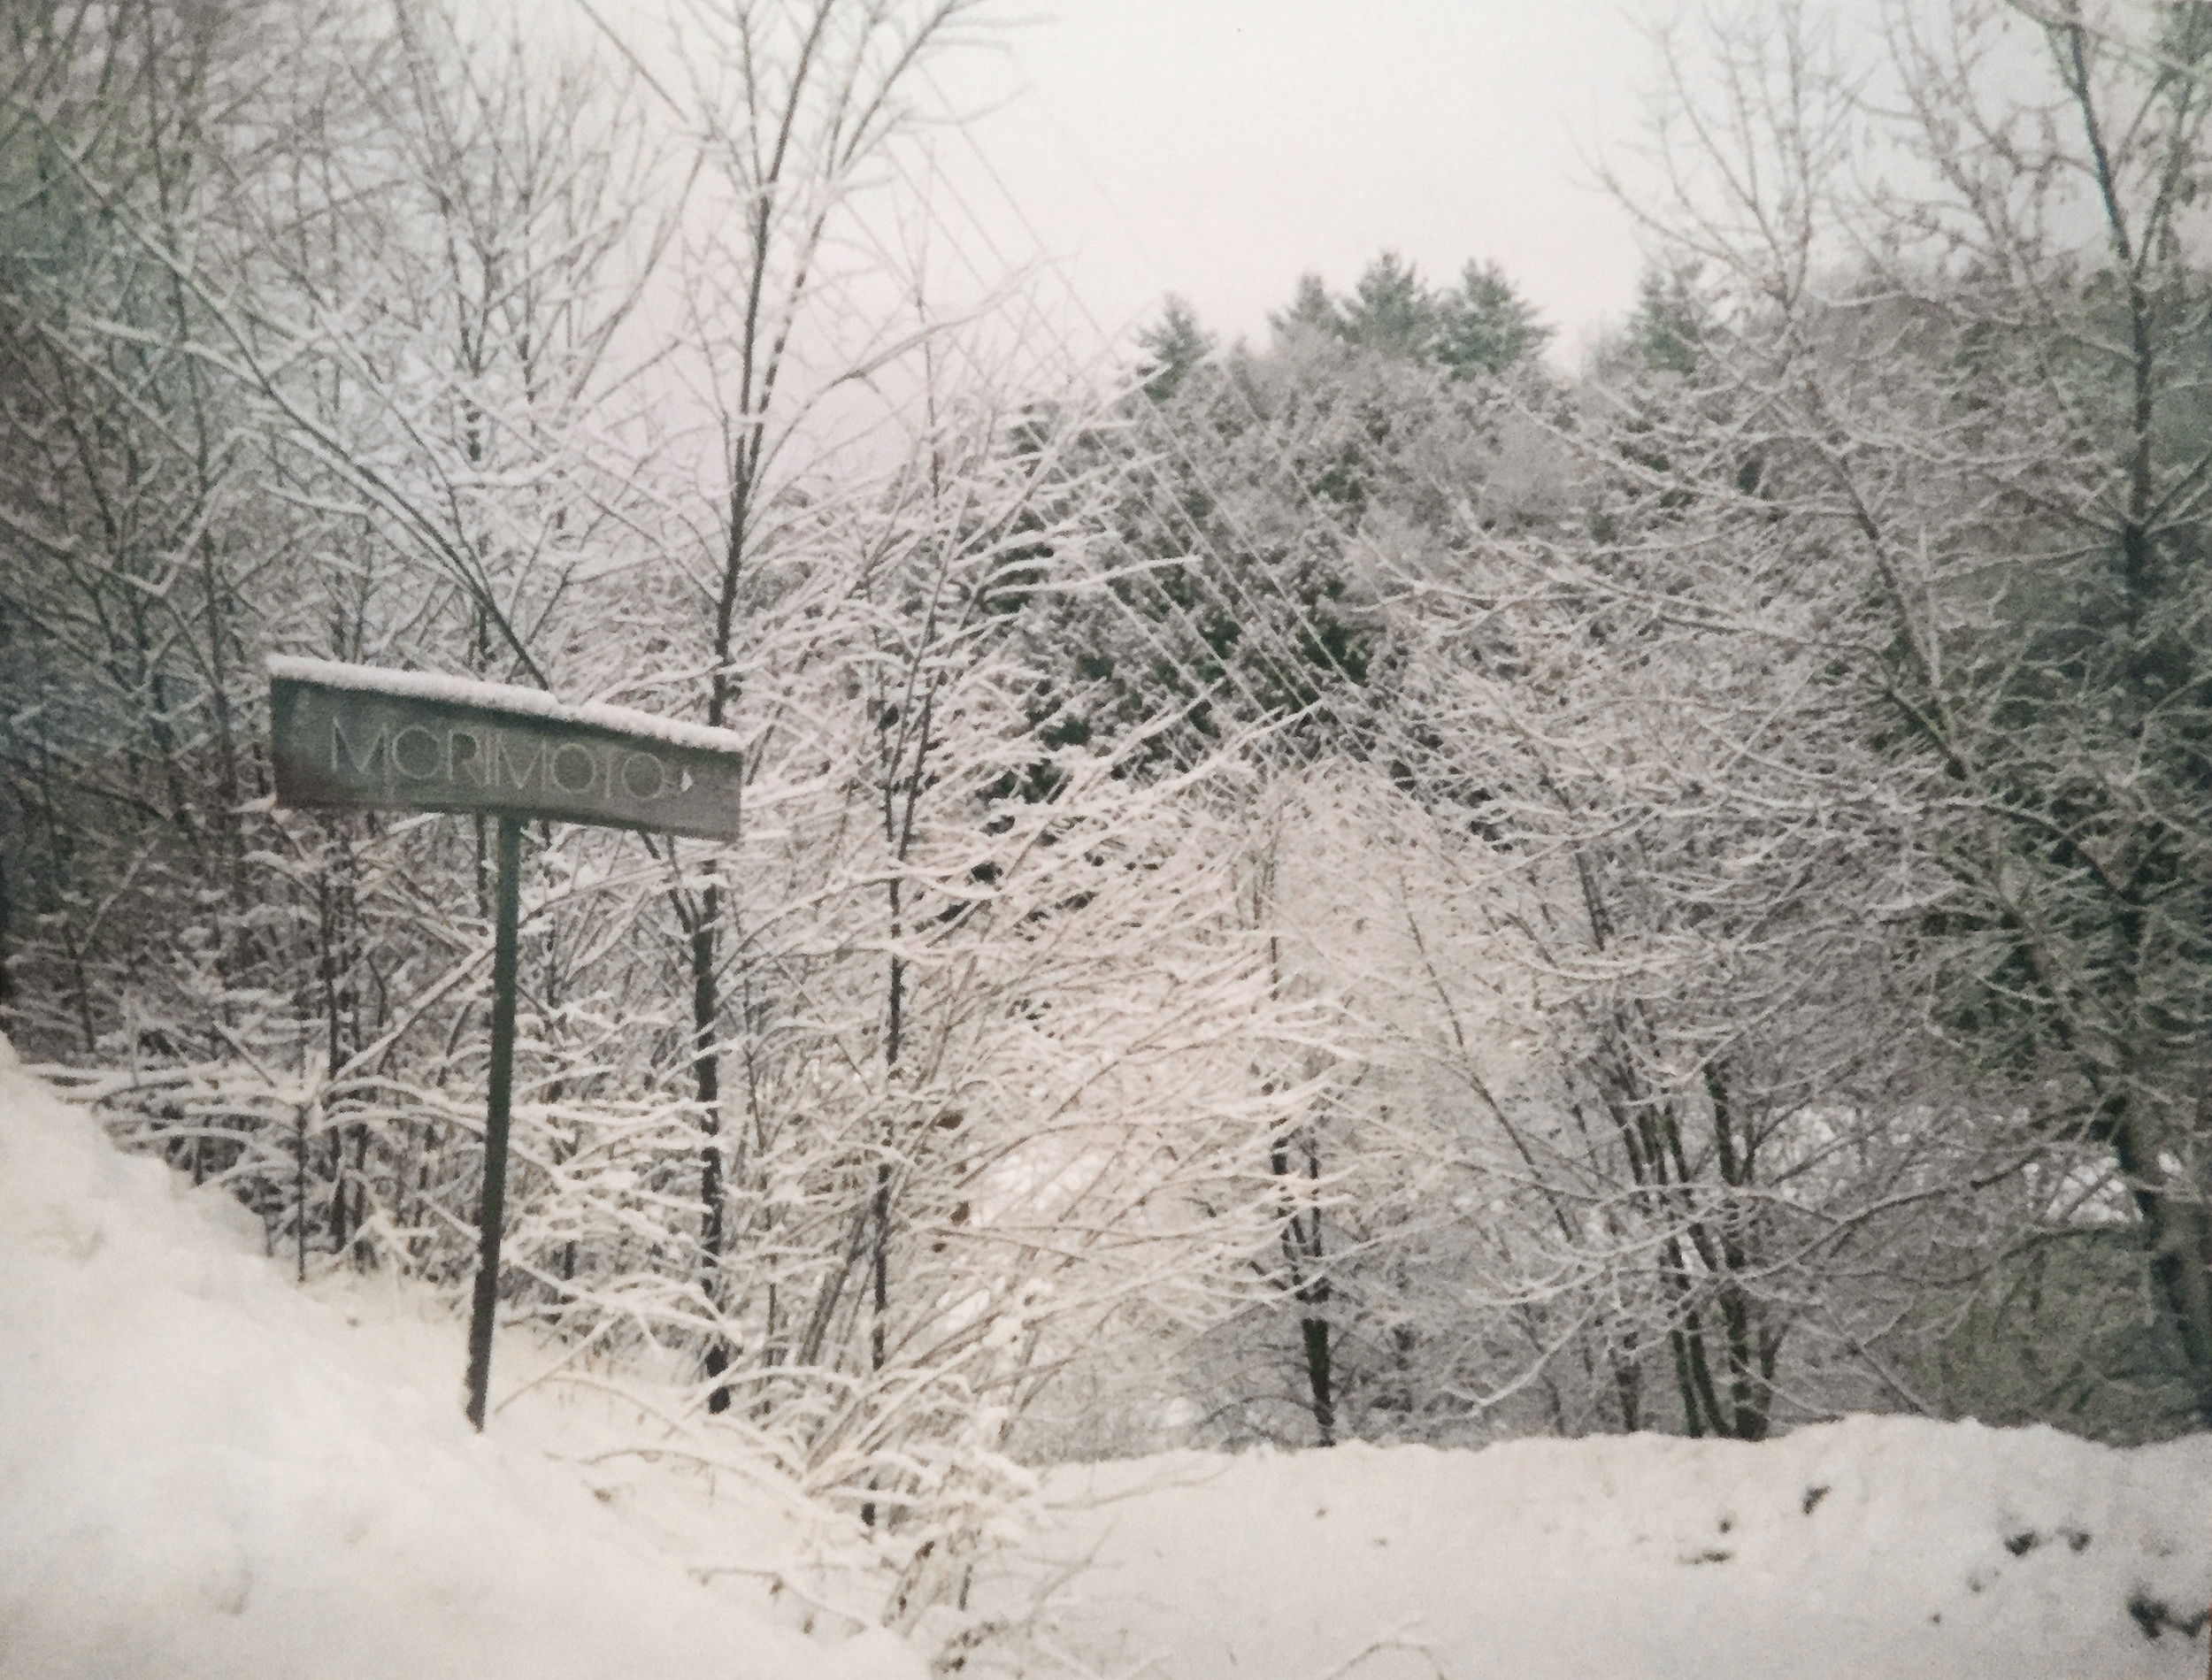 Morimoto sign in snow